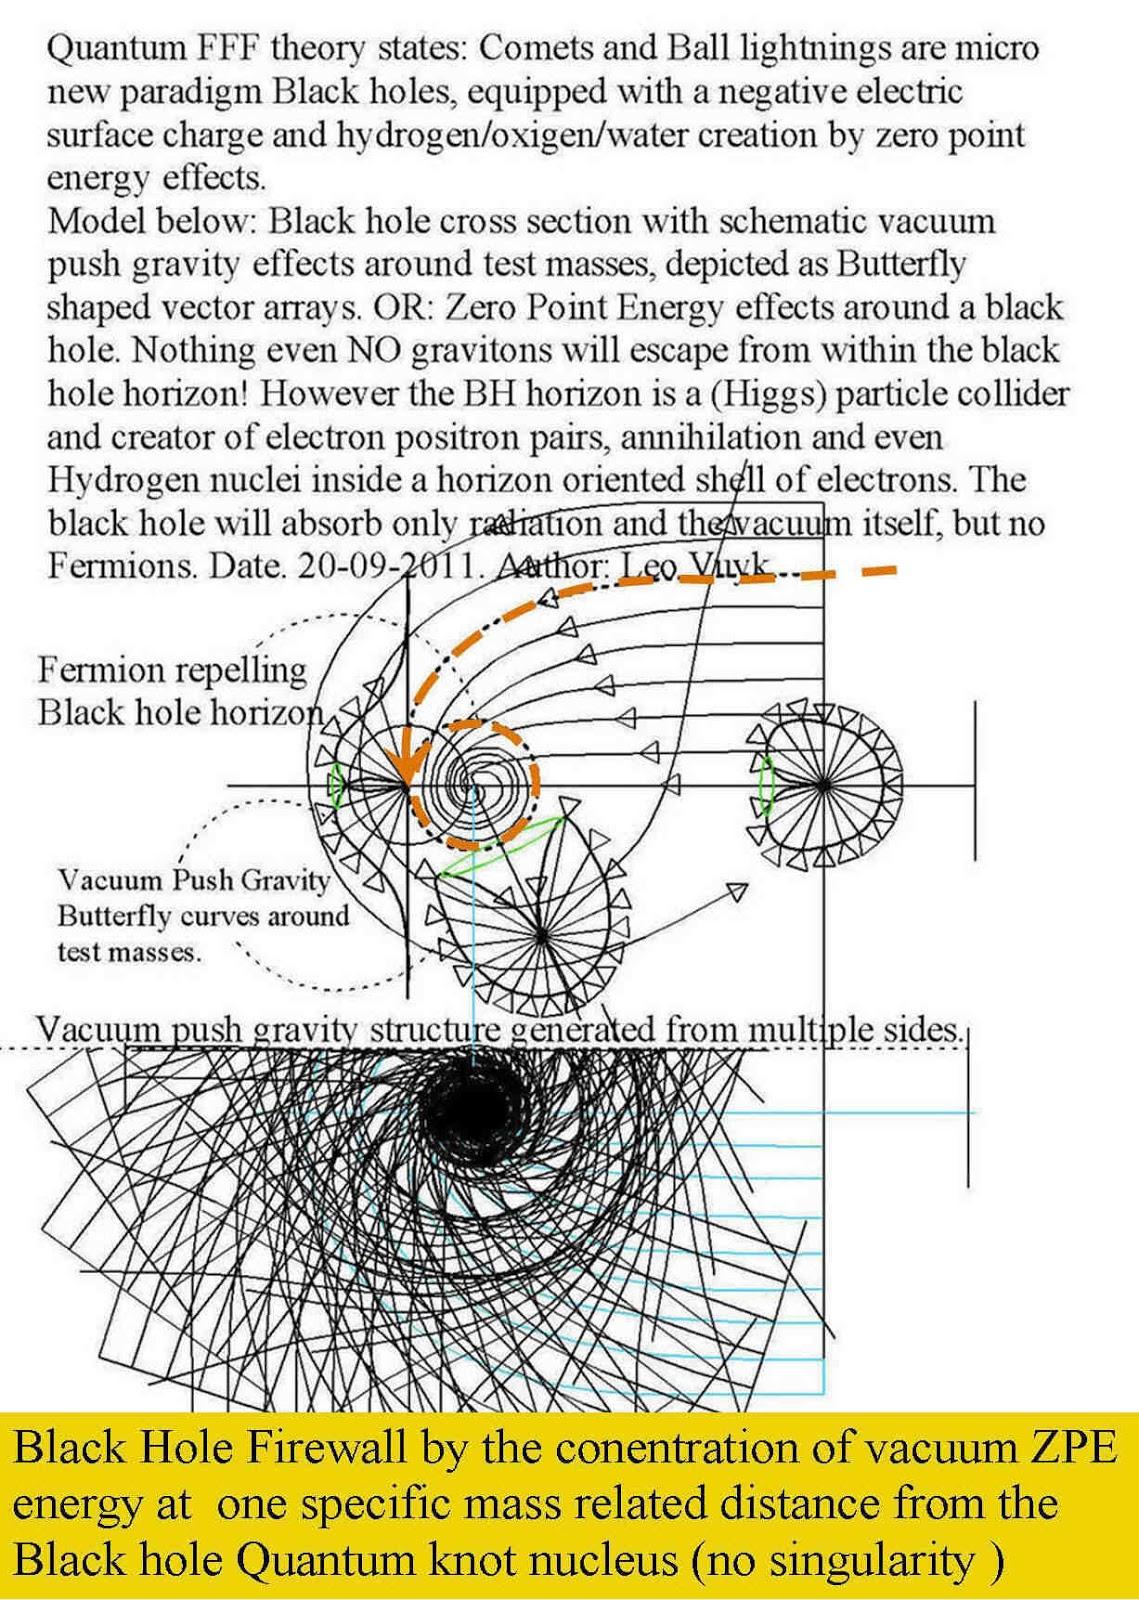 black holes firewall - photo #24